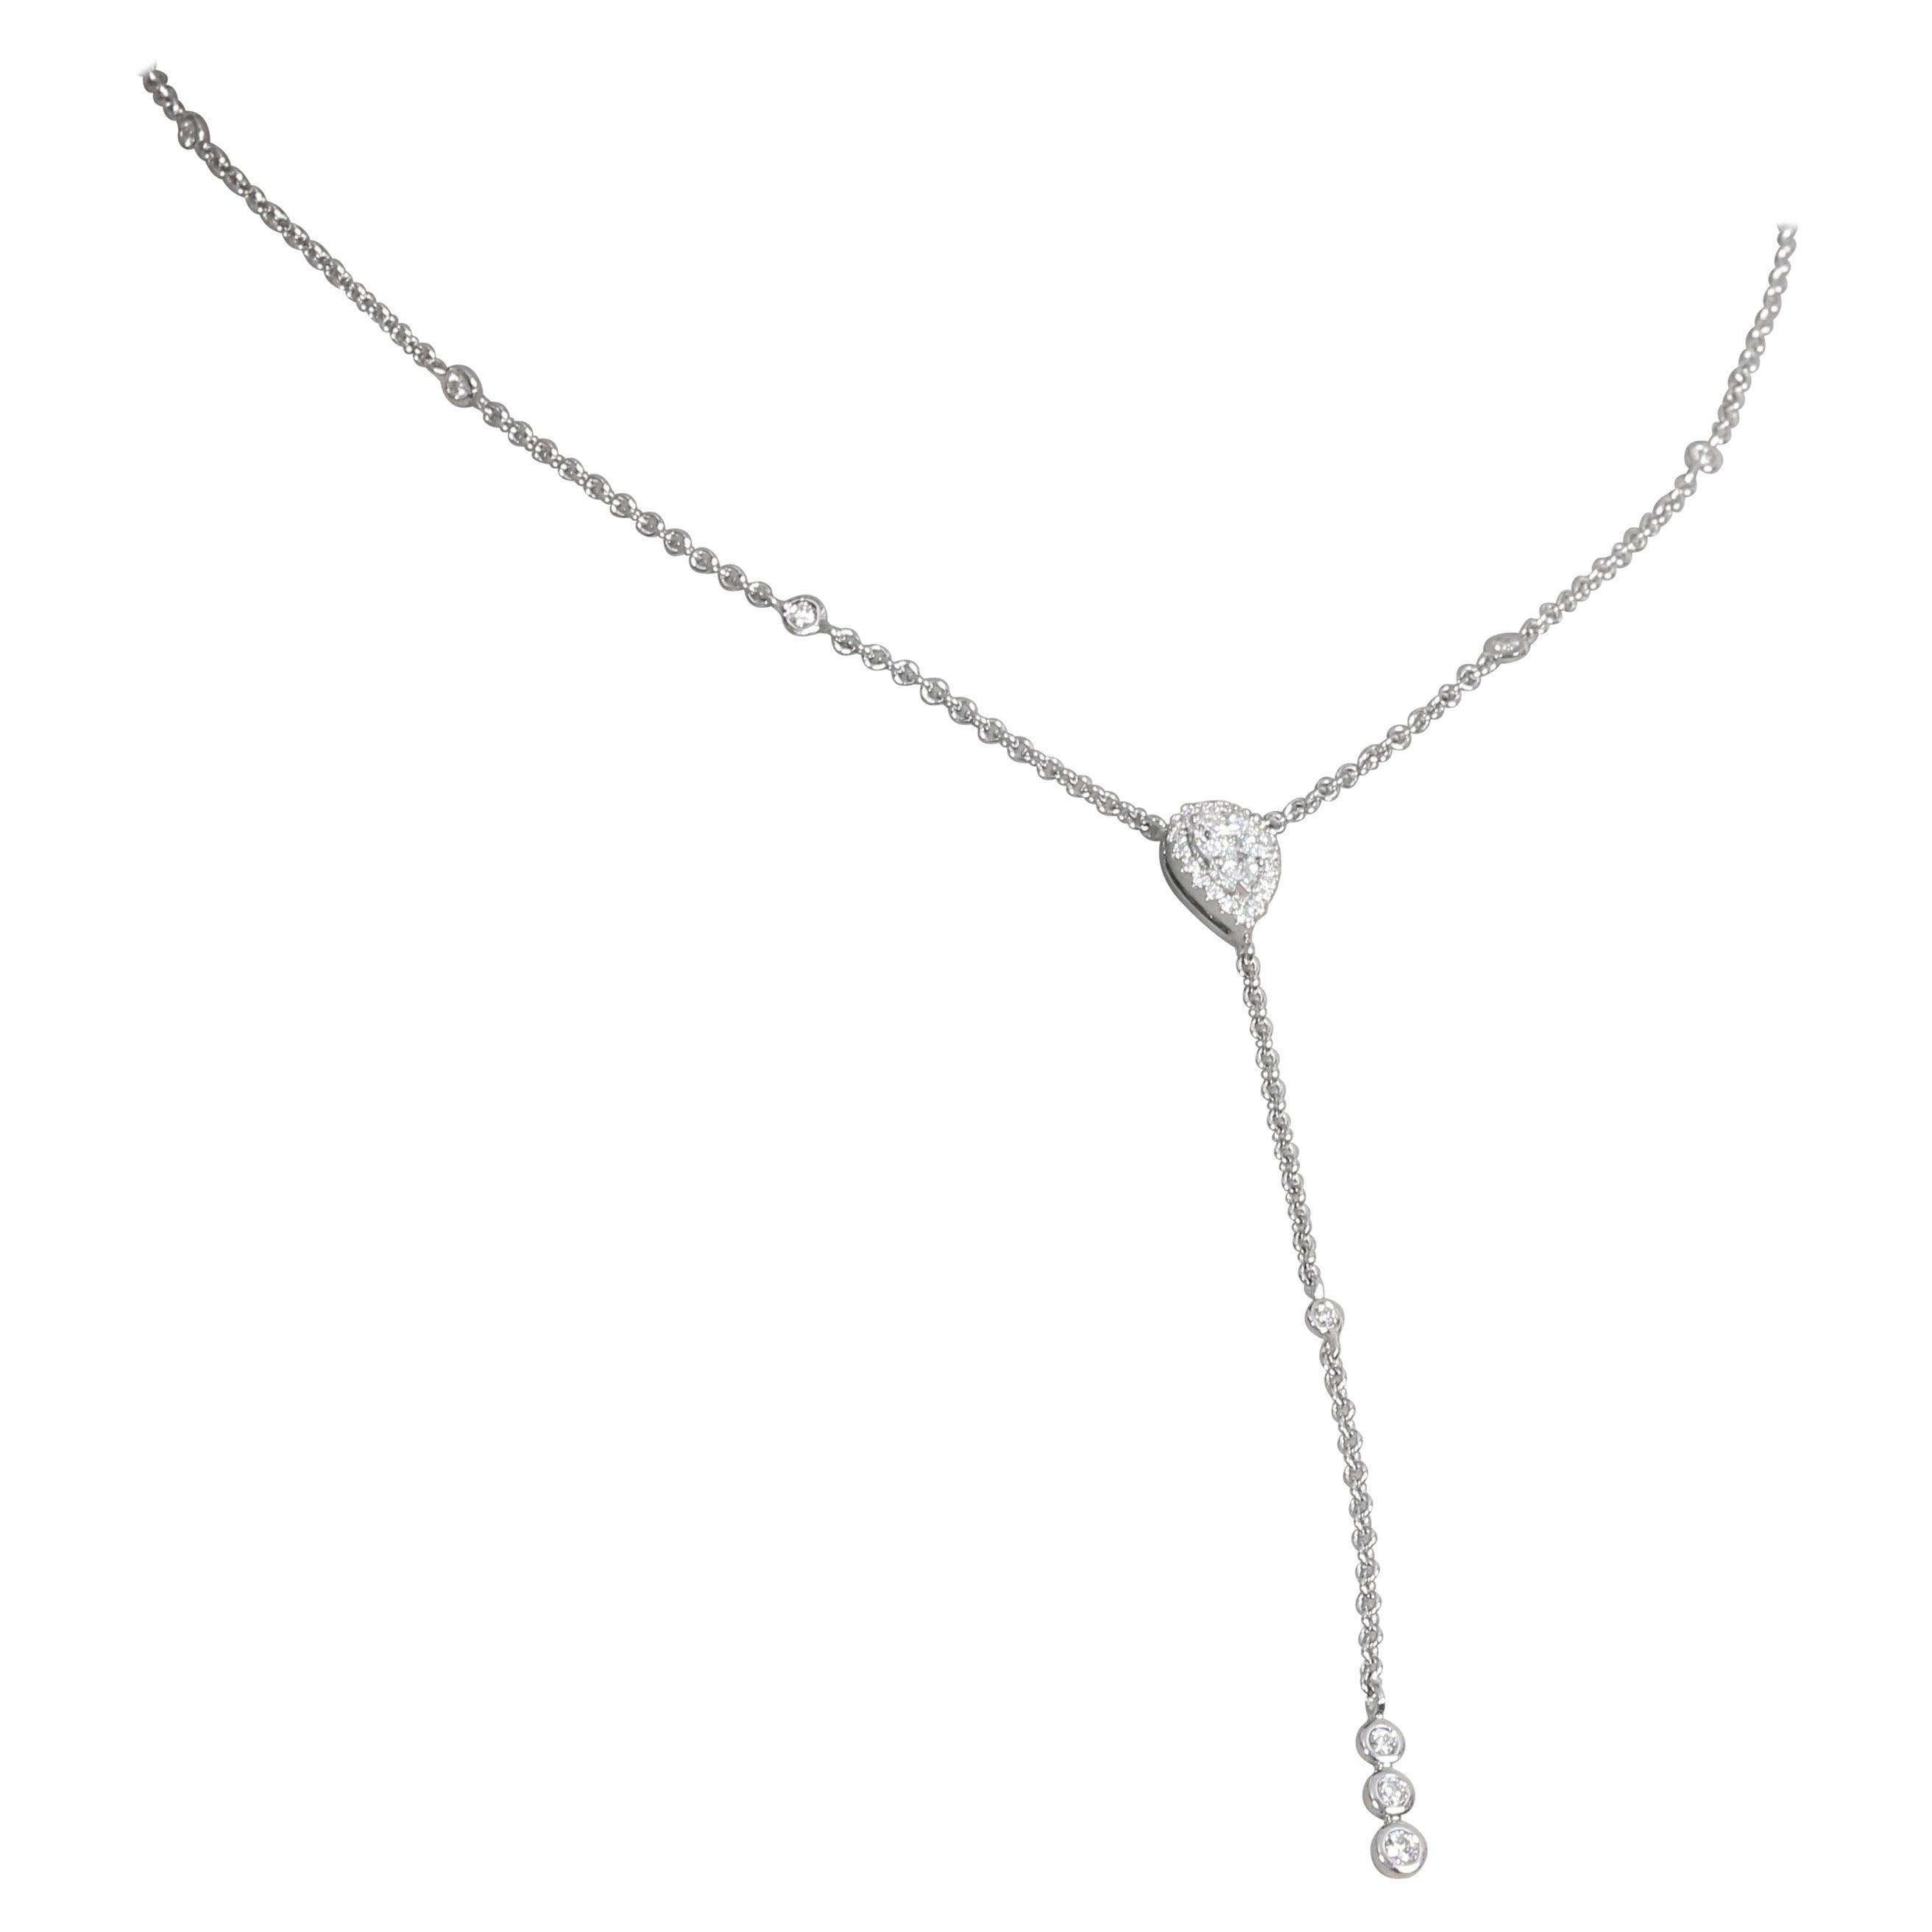 Amwaj White Gold 18 Karat Necklace with Diamonds